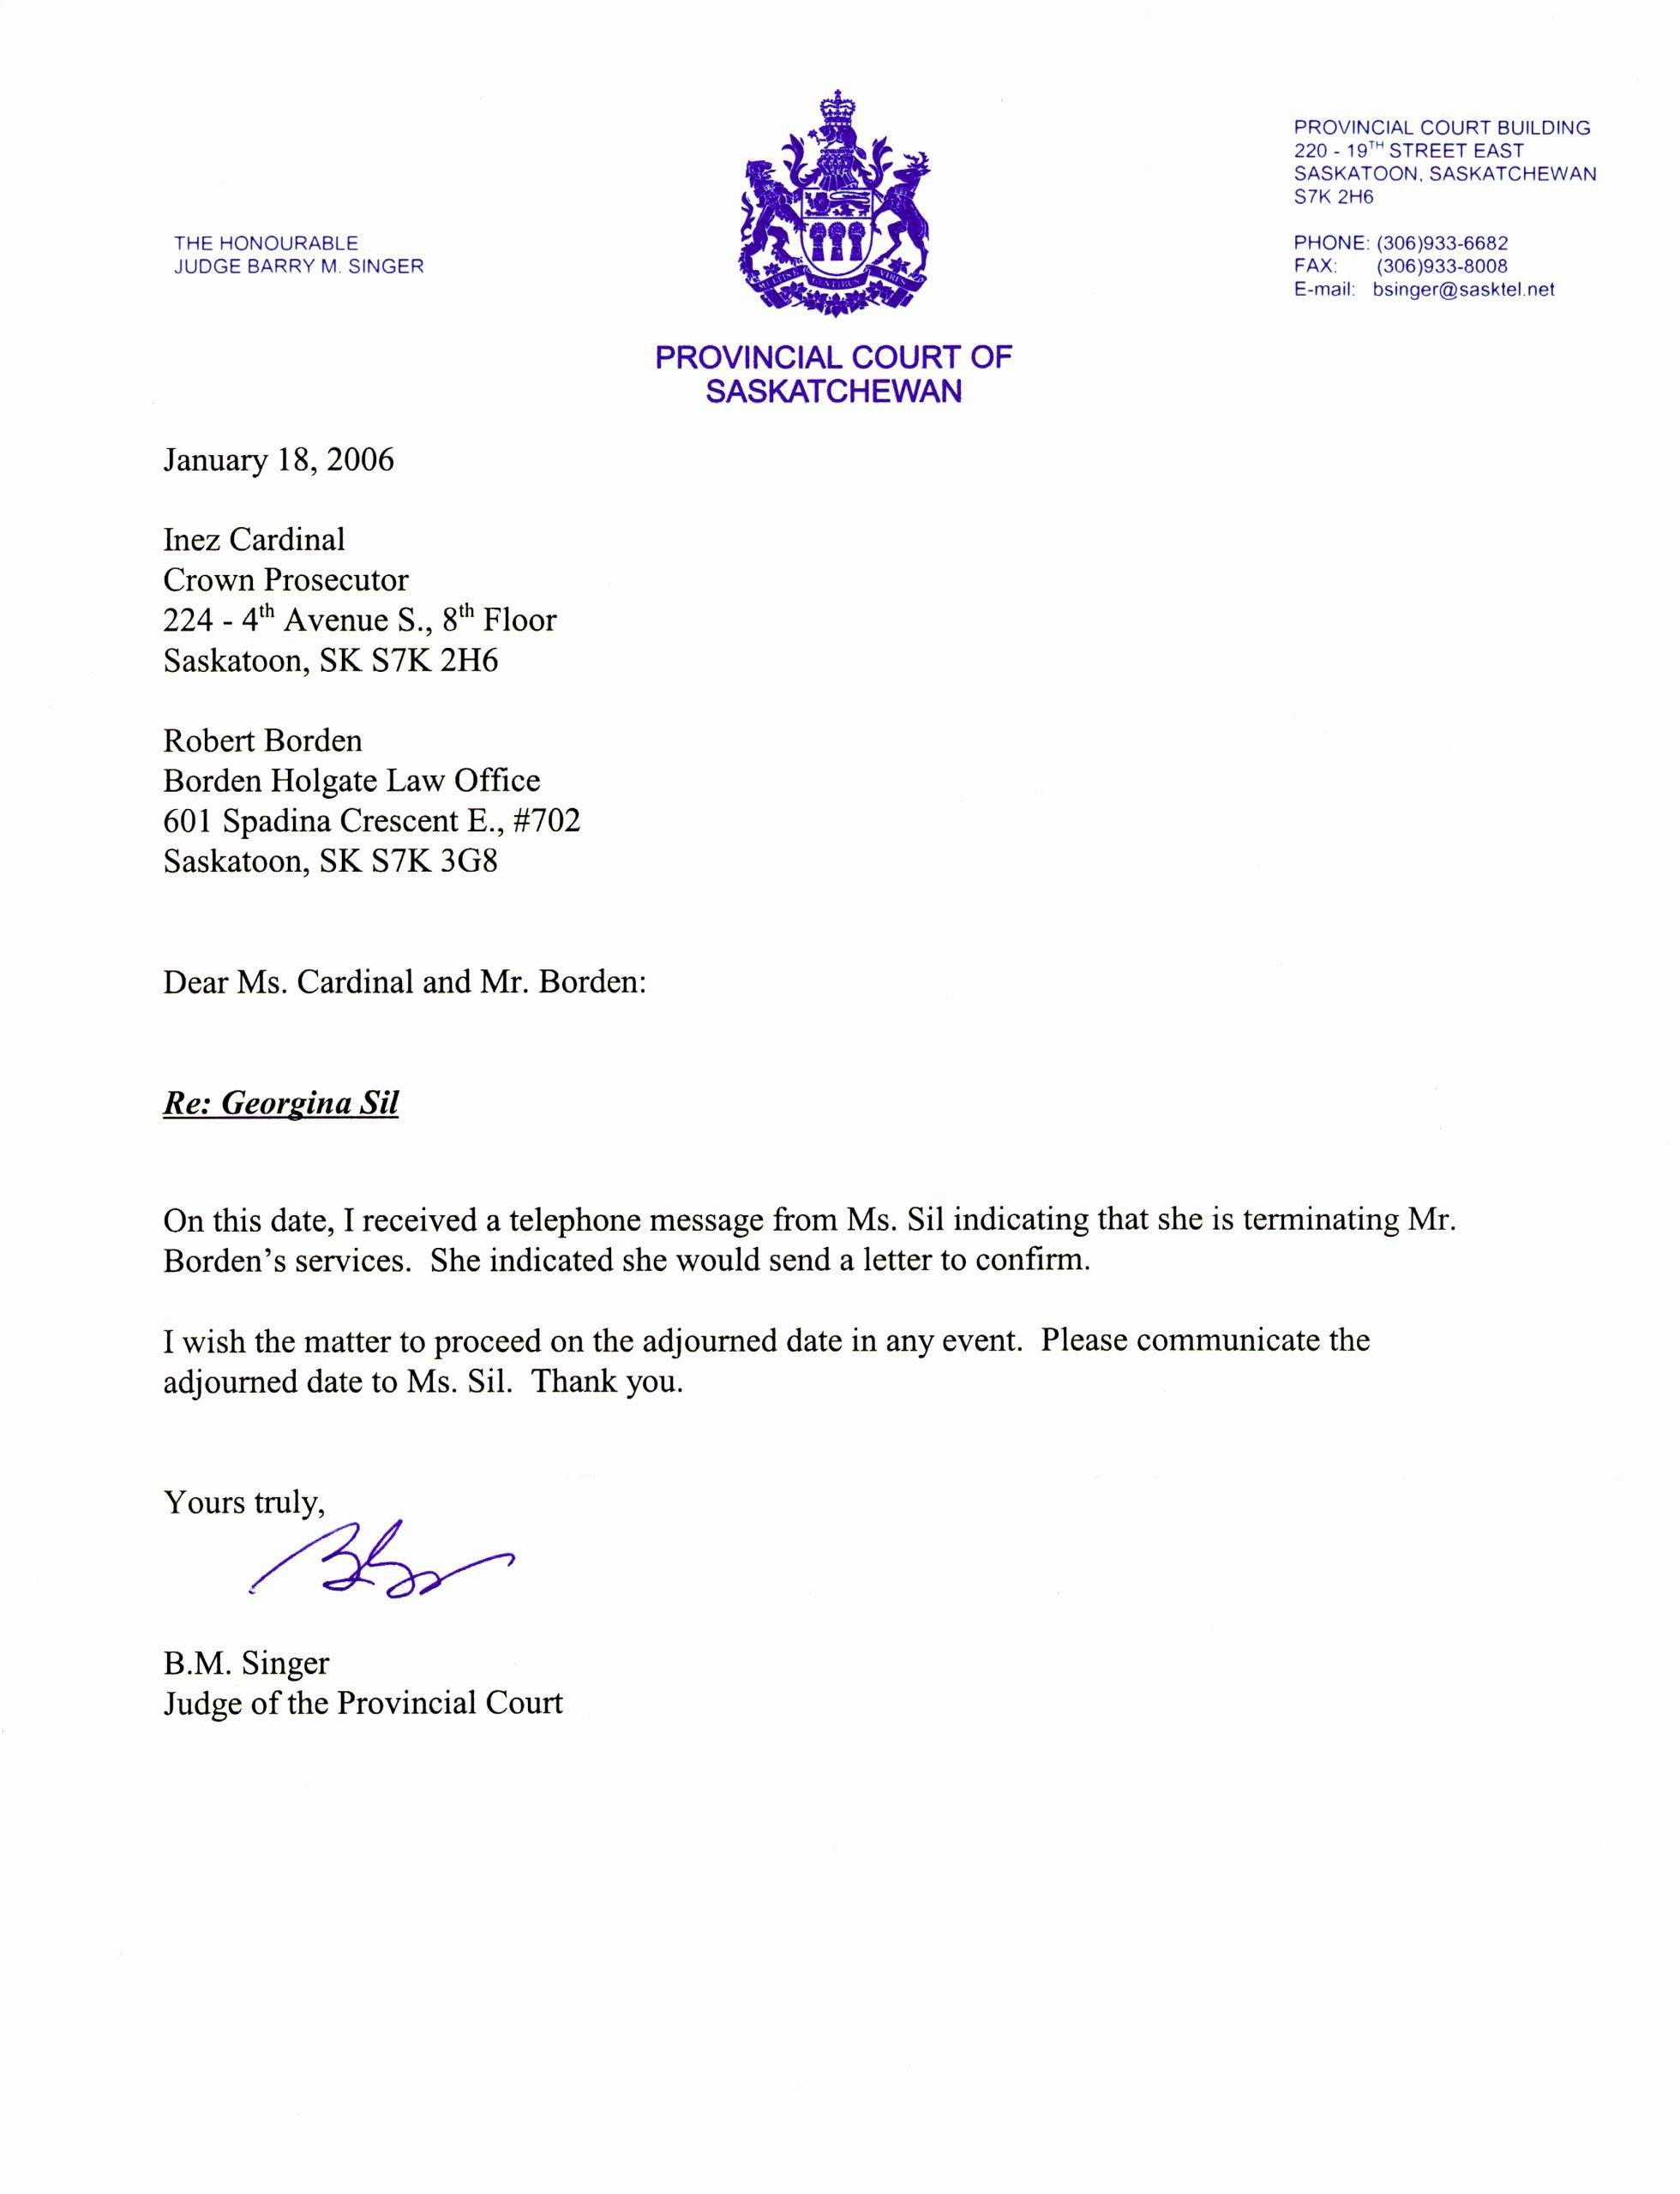 Sample Letter Of Representation Lovely Letter to Terminate attorney Representation